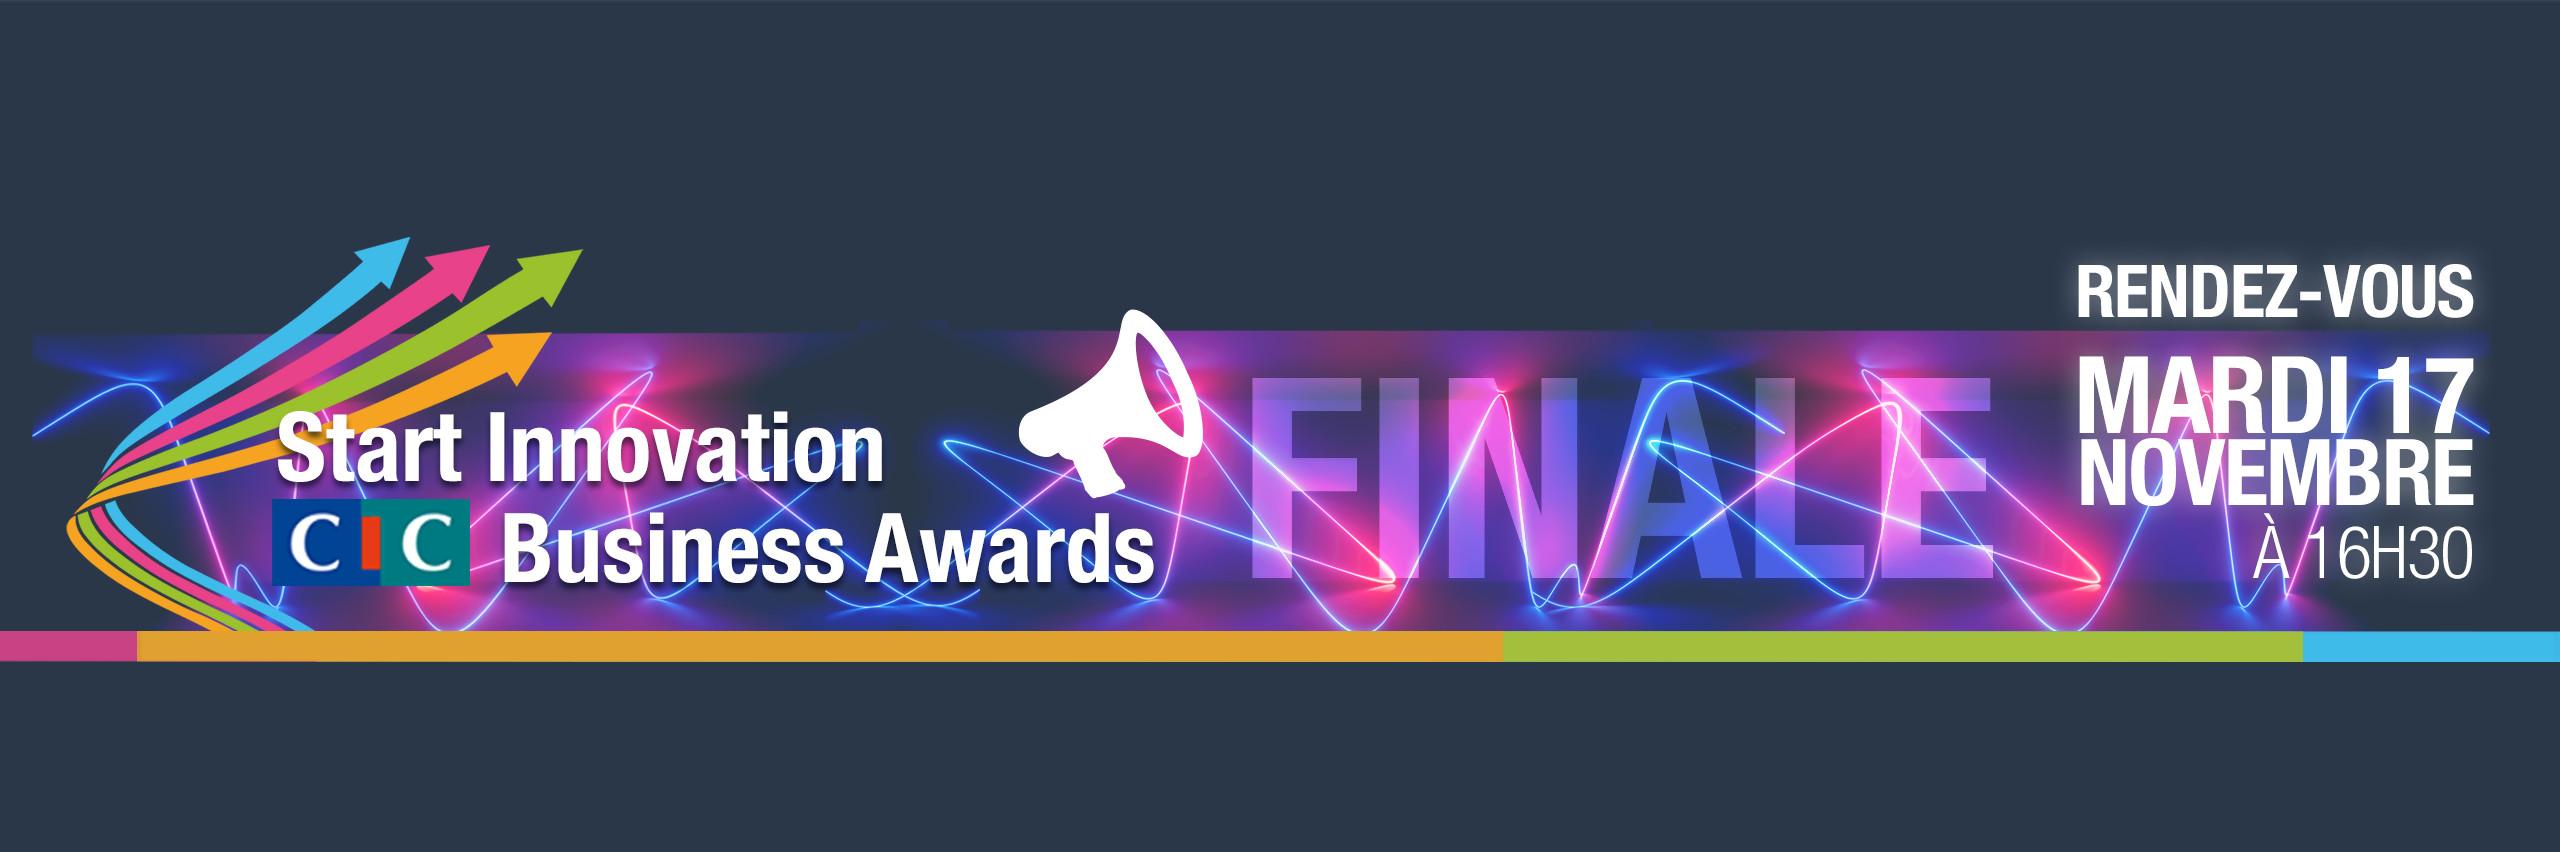 Start Innovation - CIC Business Awards